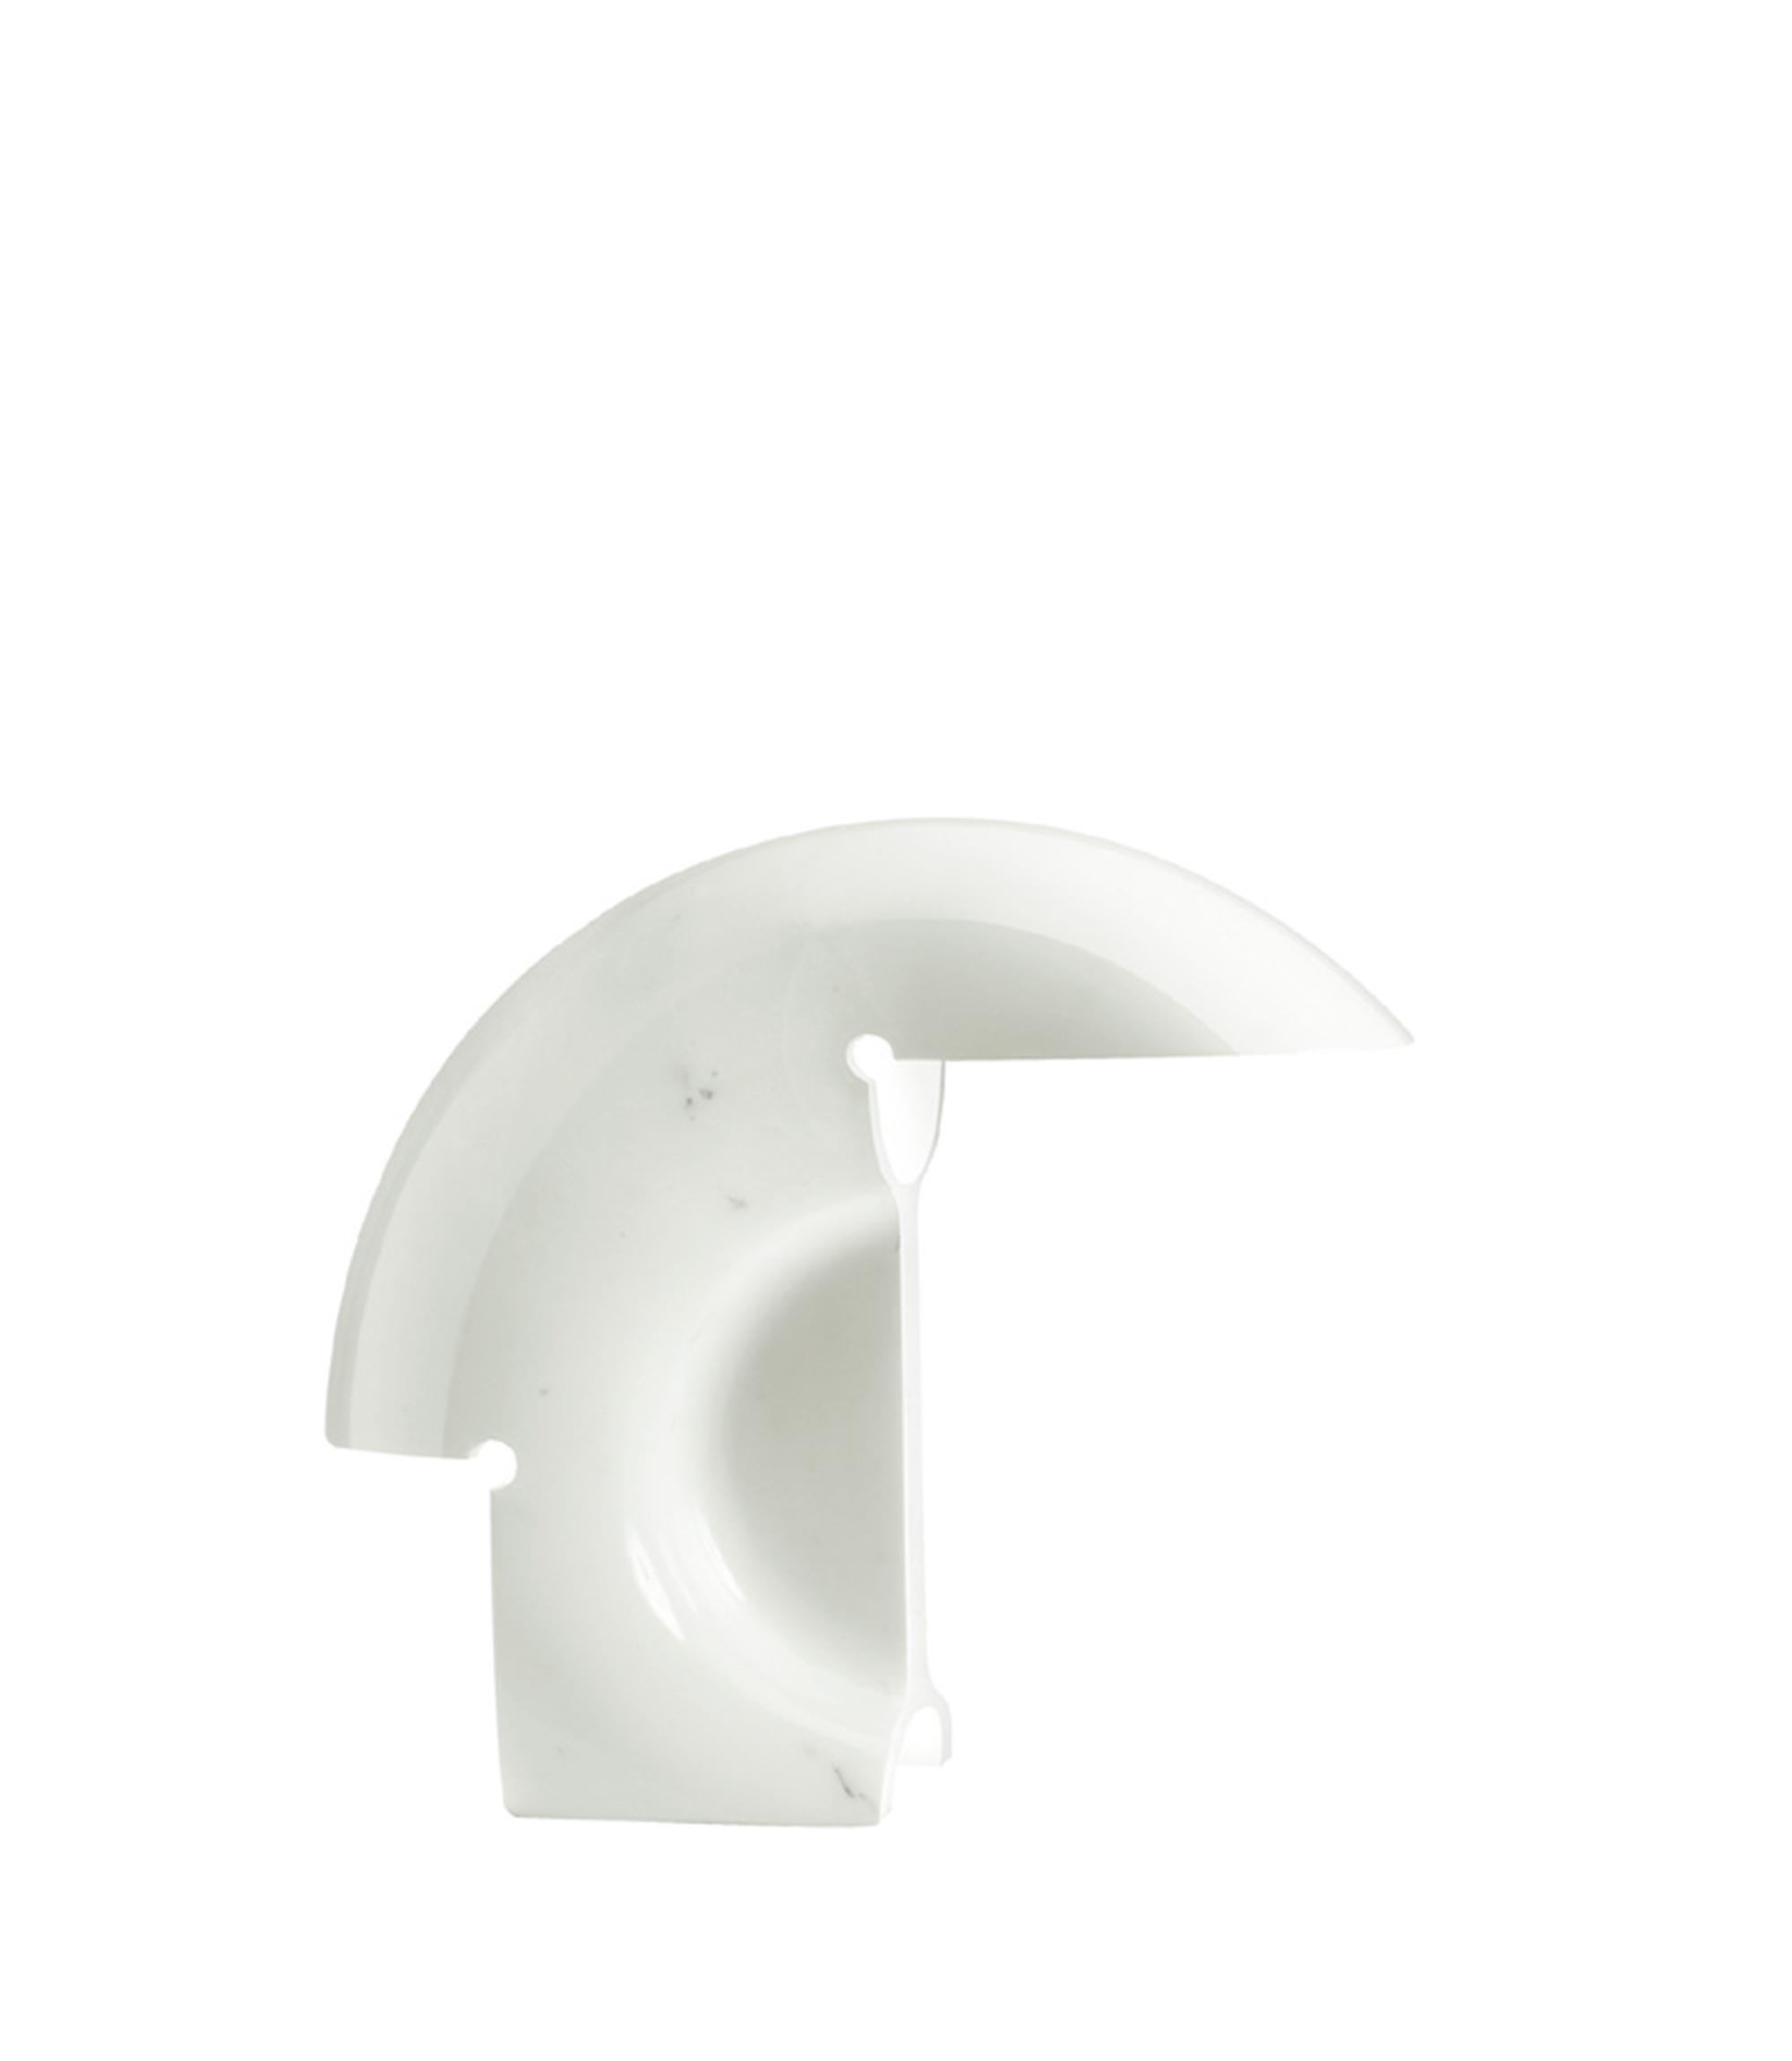 Biagio table scarpa flos F070000 product still life big 3